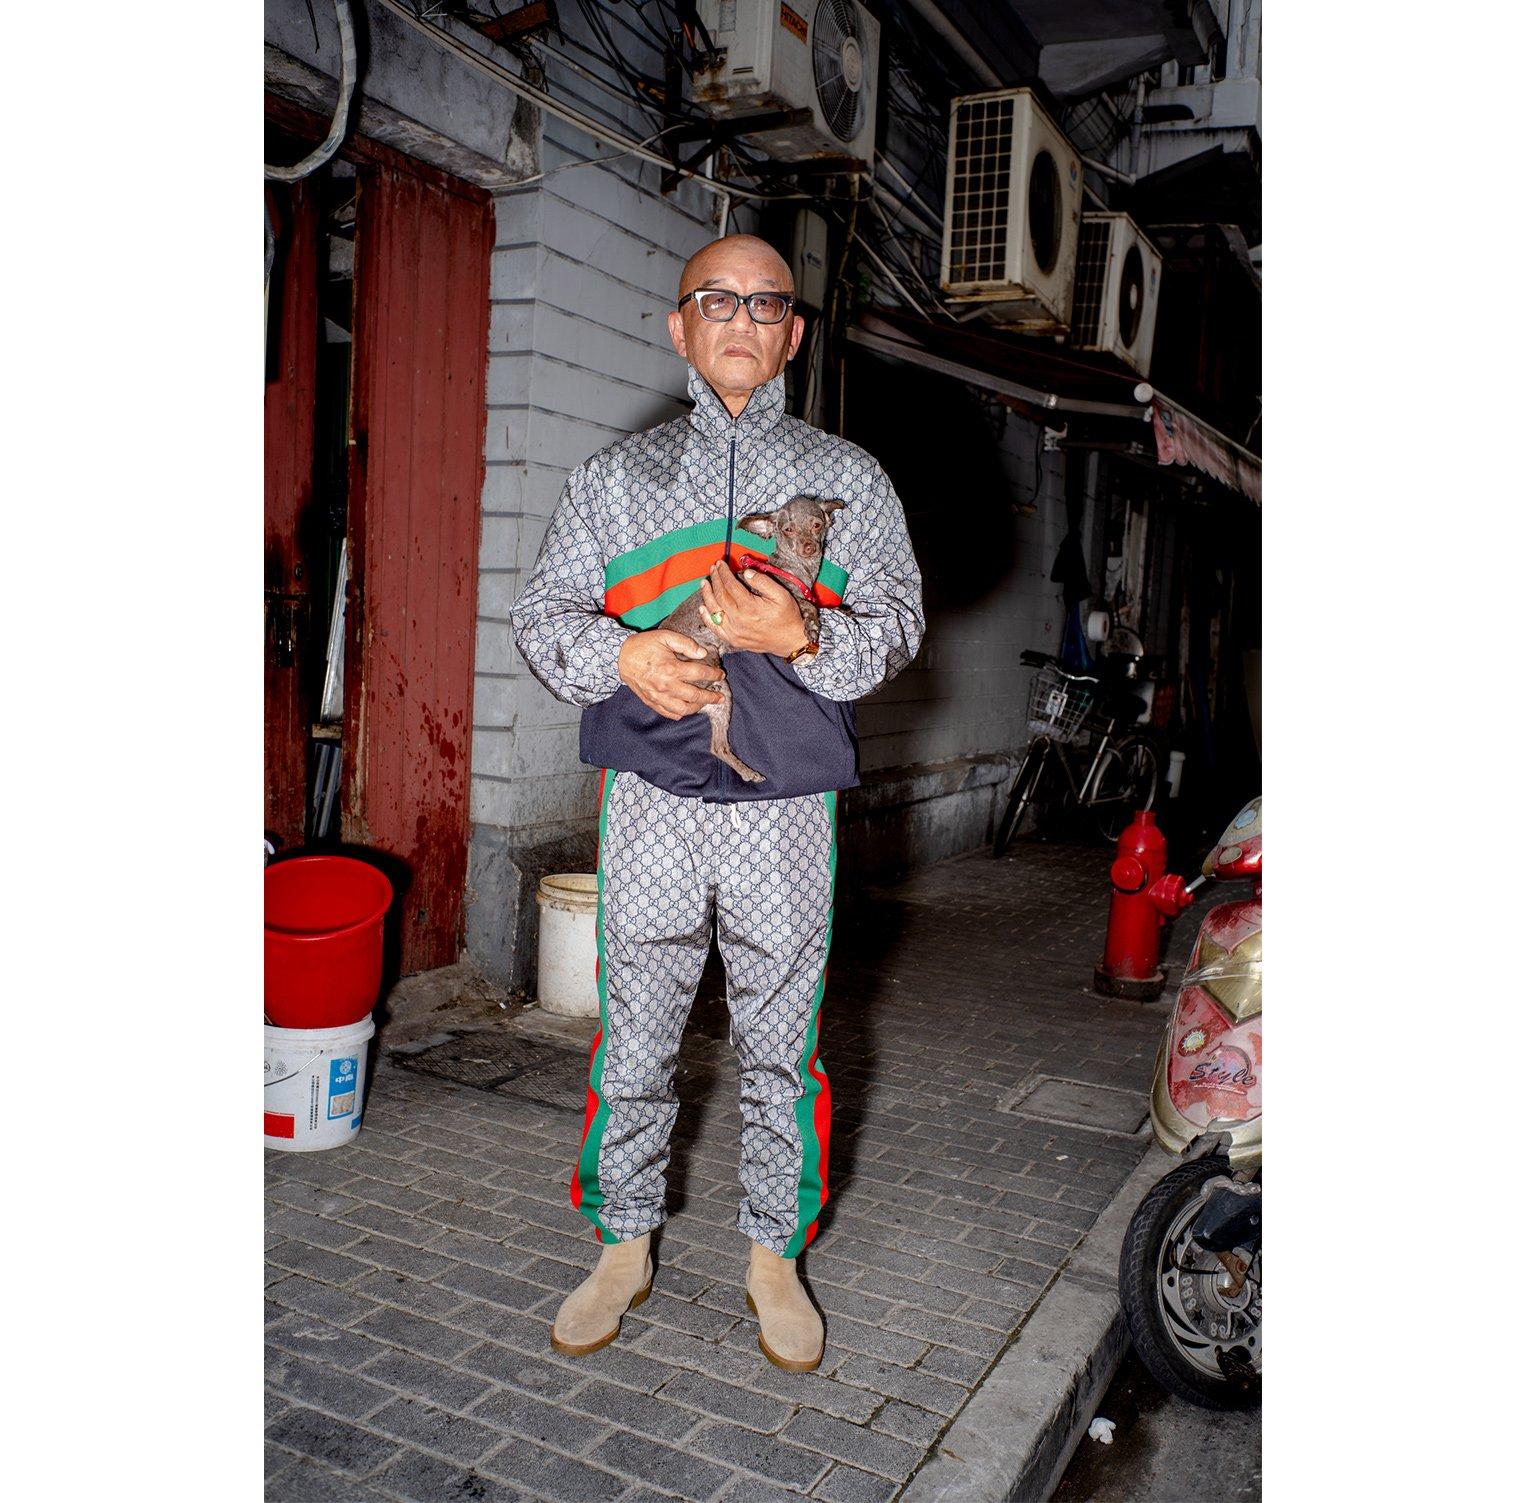 17b13f9a5fa SSENSE: Gucci's Urban Arcadia: View this year in Gucci editorials ...